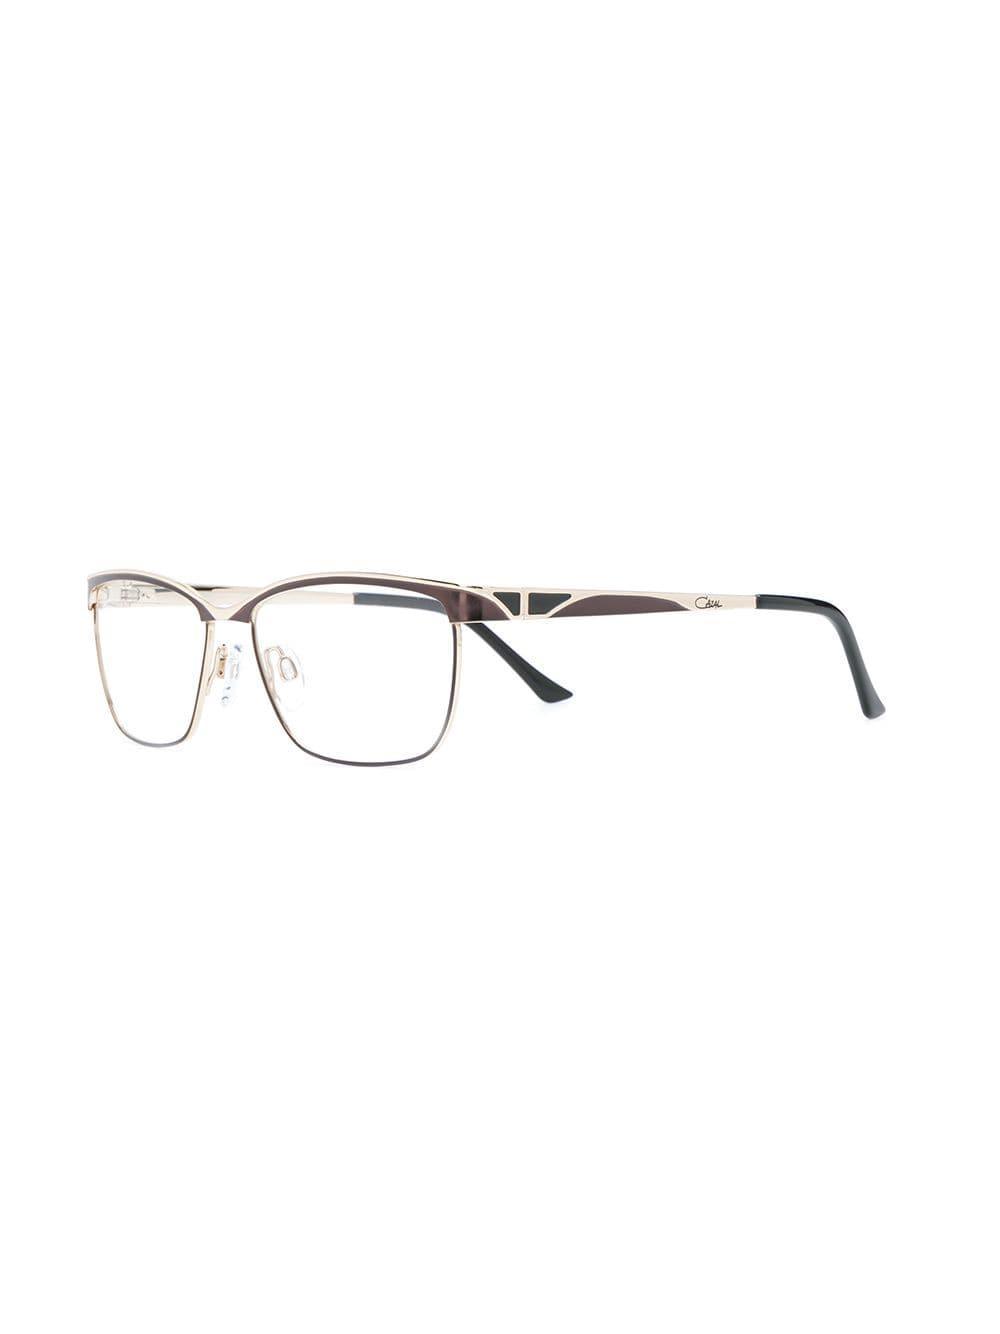 Lyst - Cazal Rectangle Frame Glasses in Brown